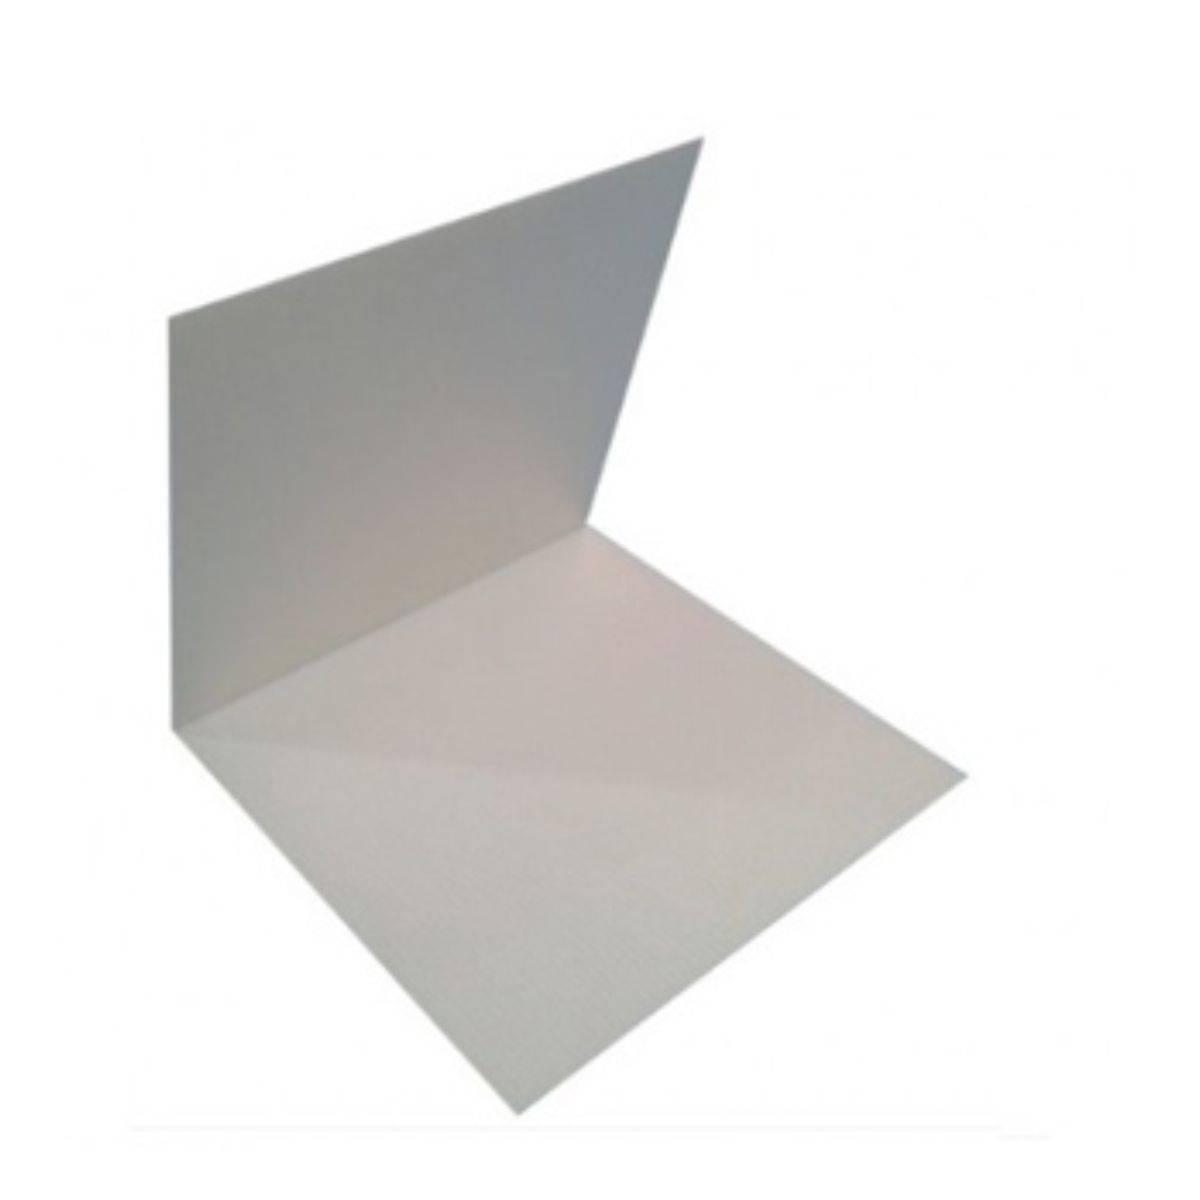 Refil Placa Adesiva para Armadilha Luminosa 450x220mm